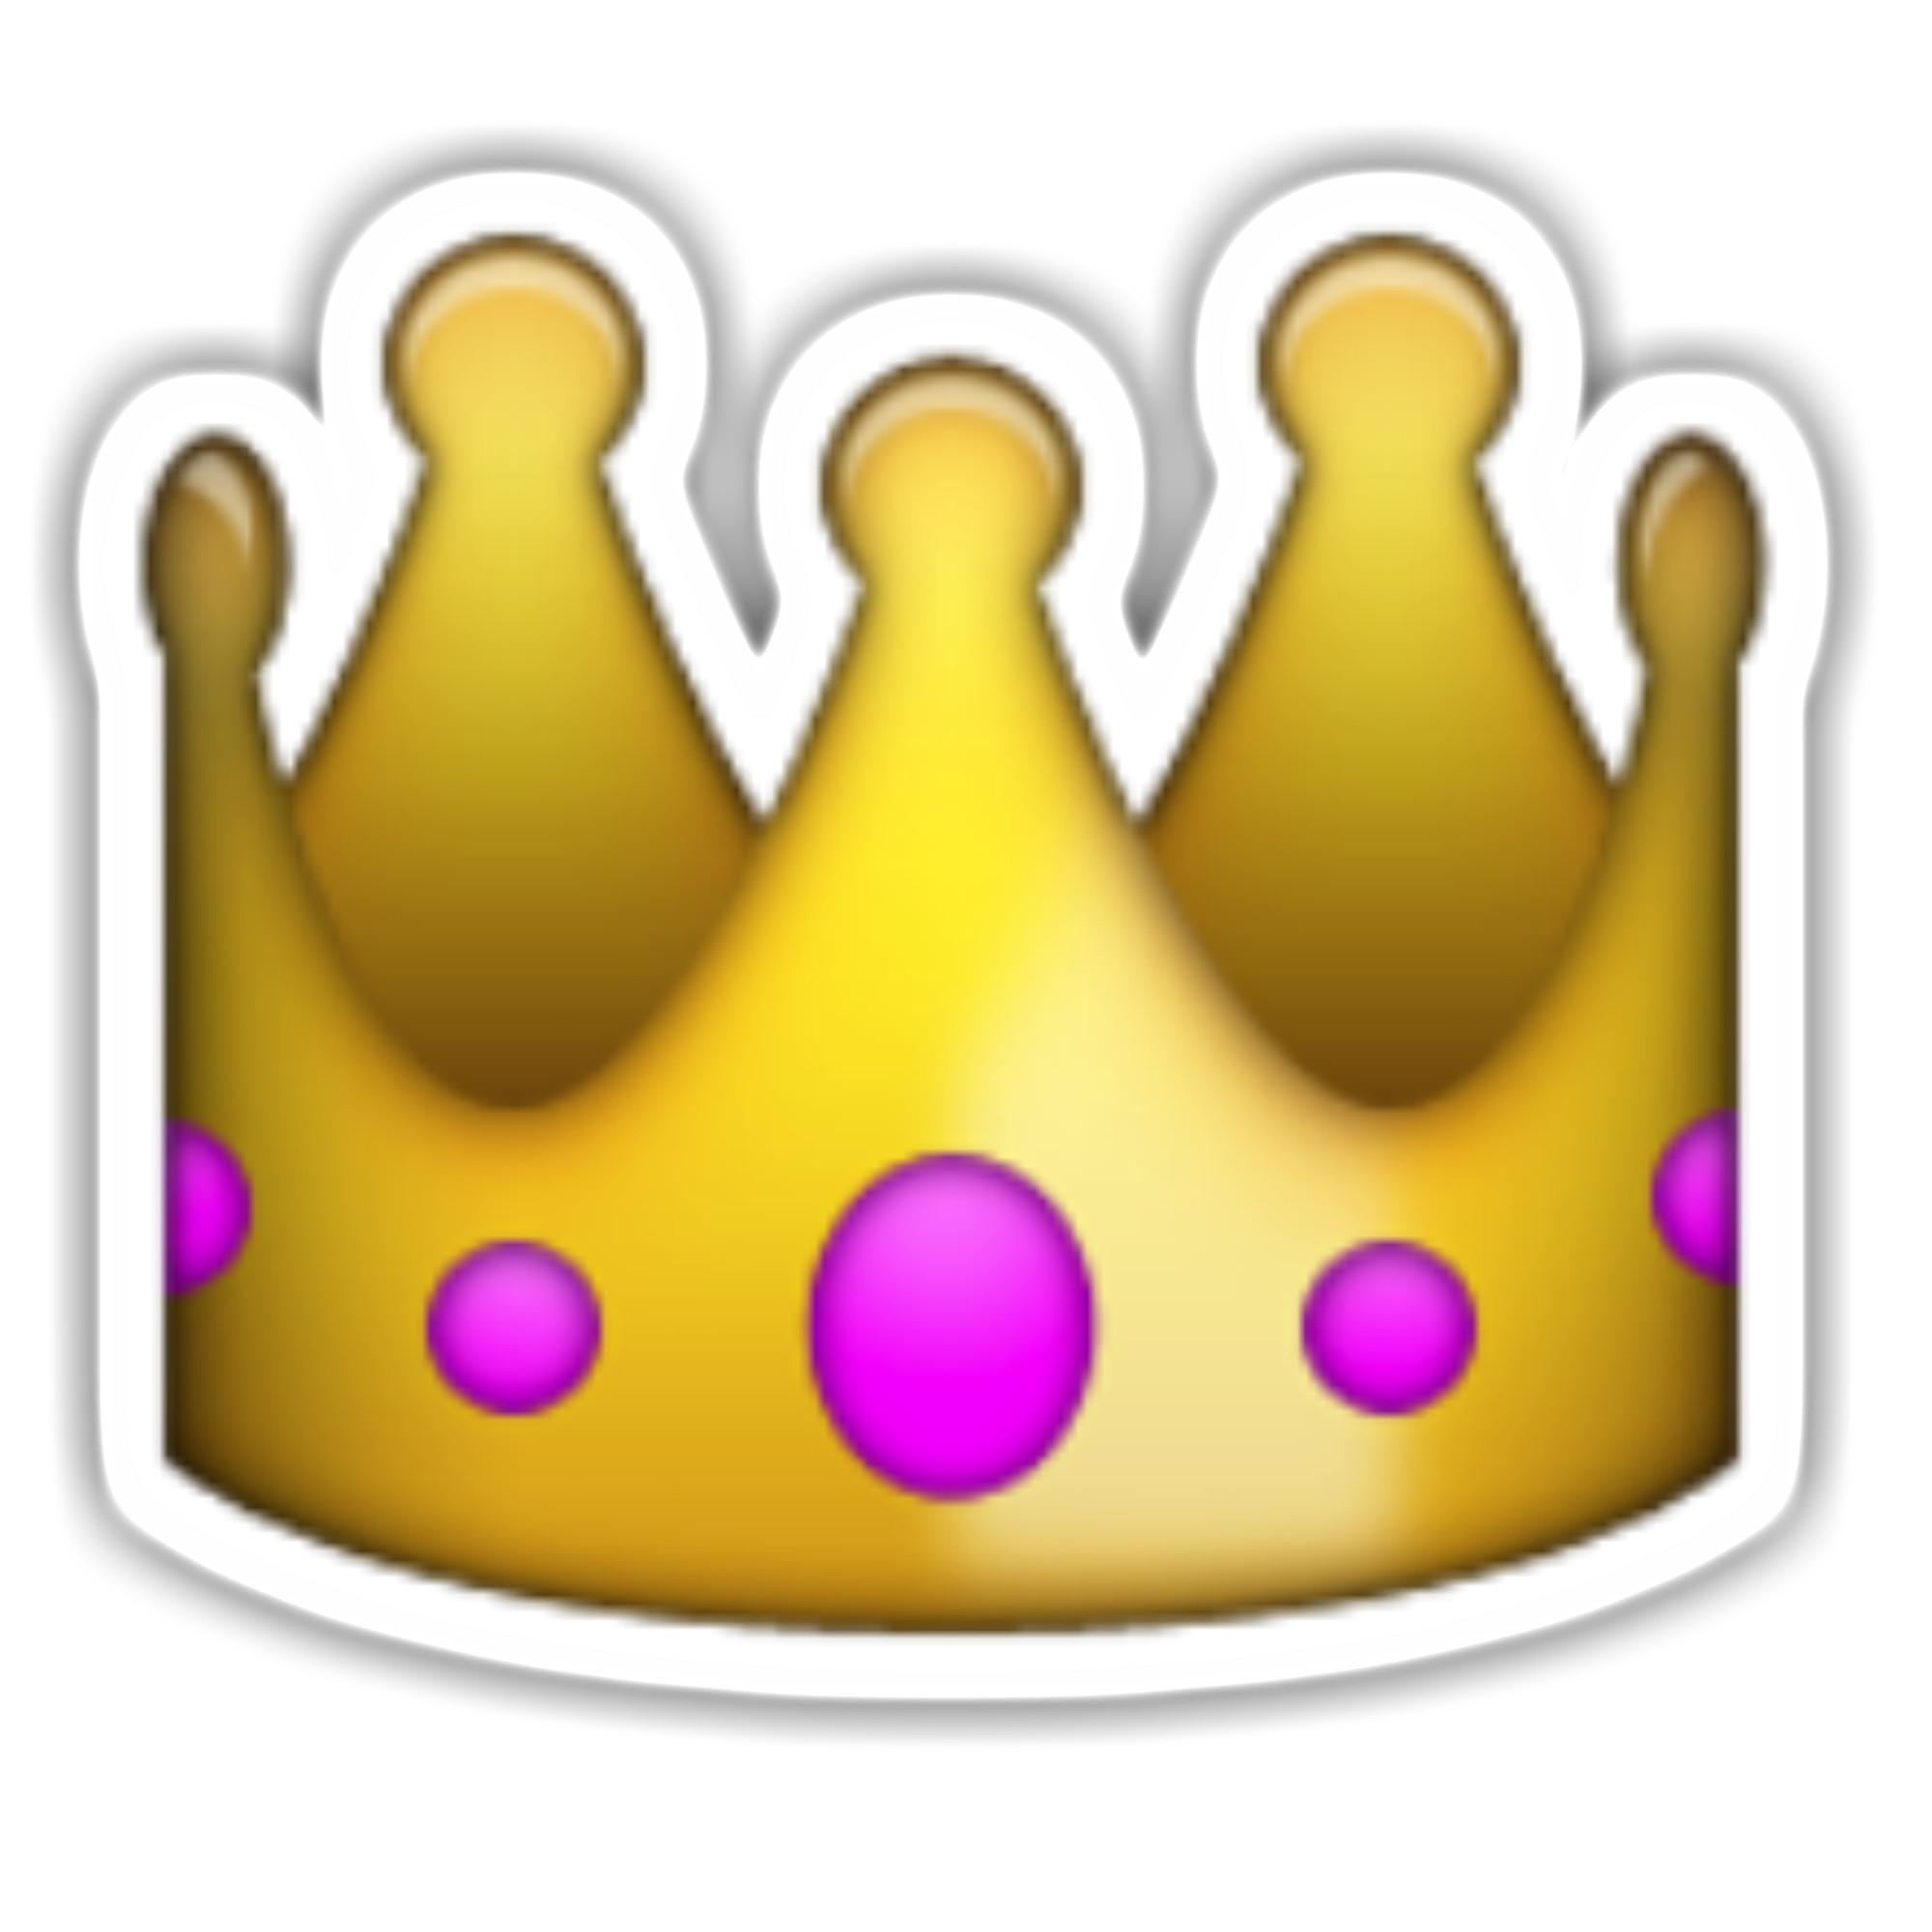 Emoji Stickers Related Keywords & Suggestions – Emoji … crown with 100  emoji wallpaper …